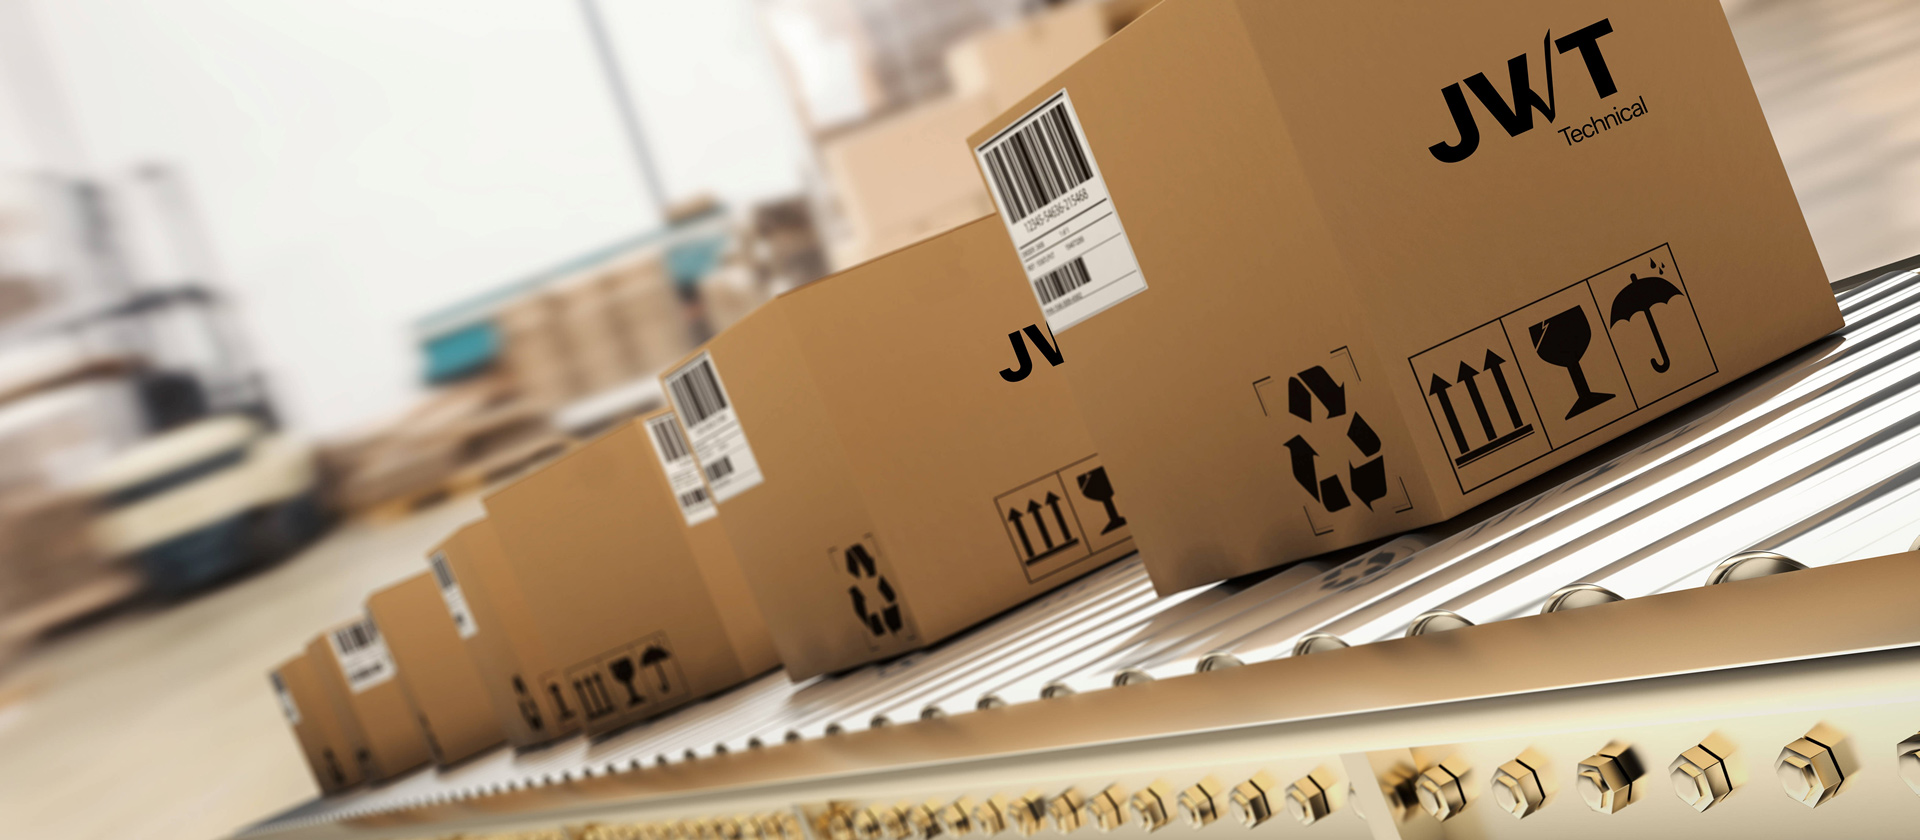 Industria del embalaje